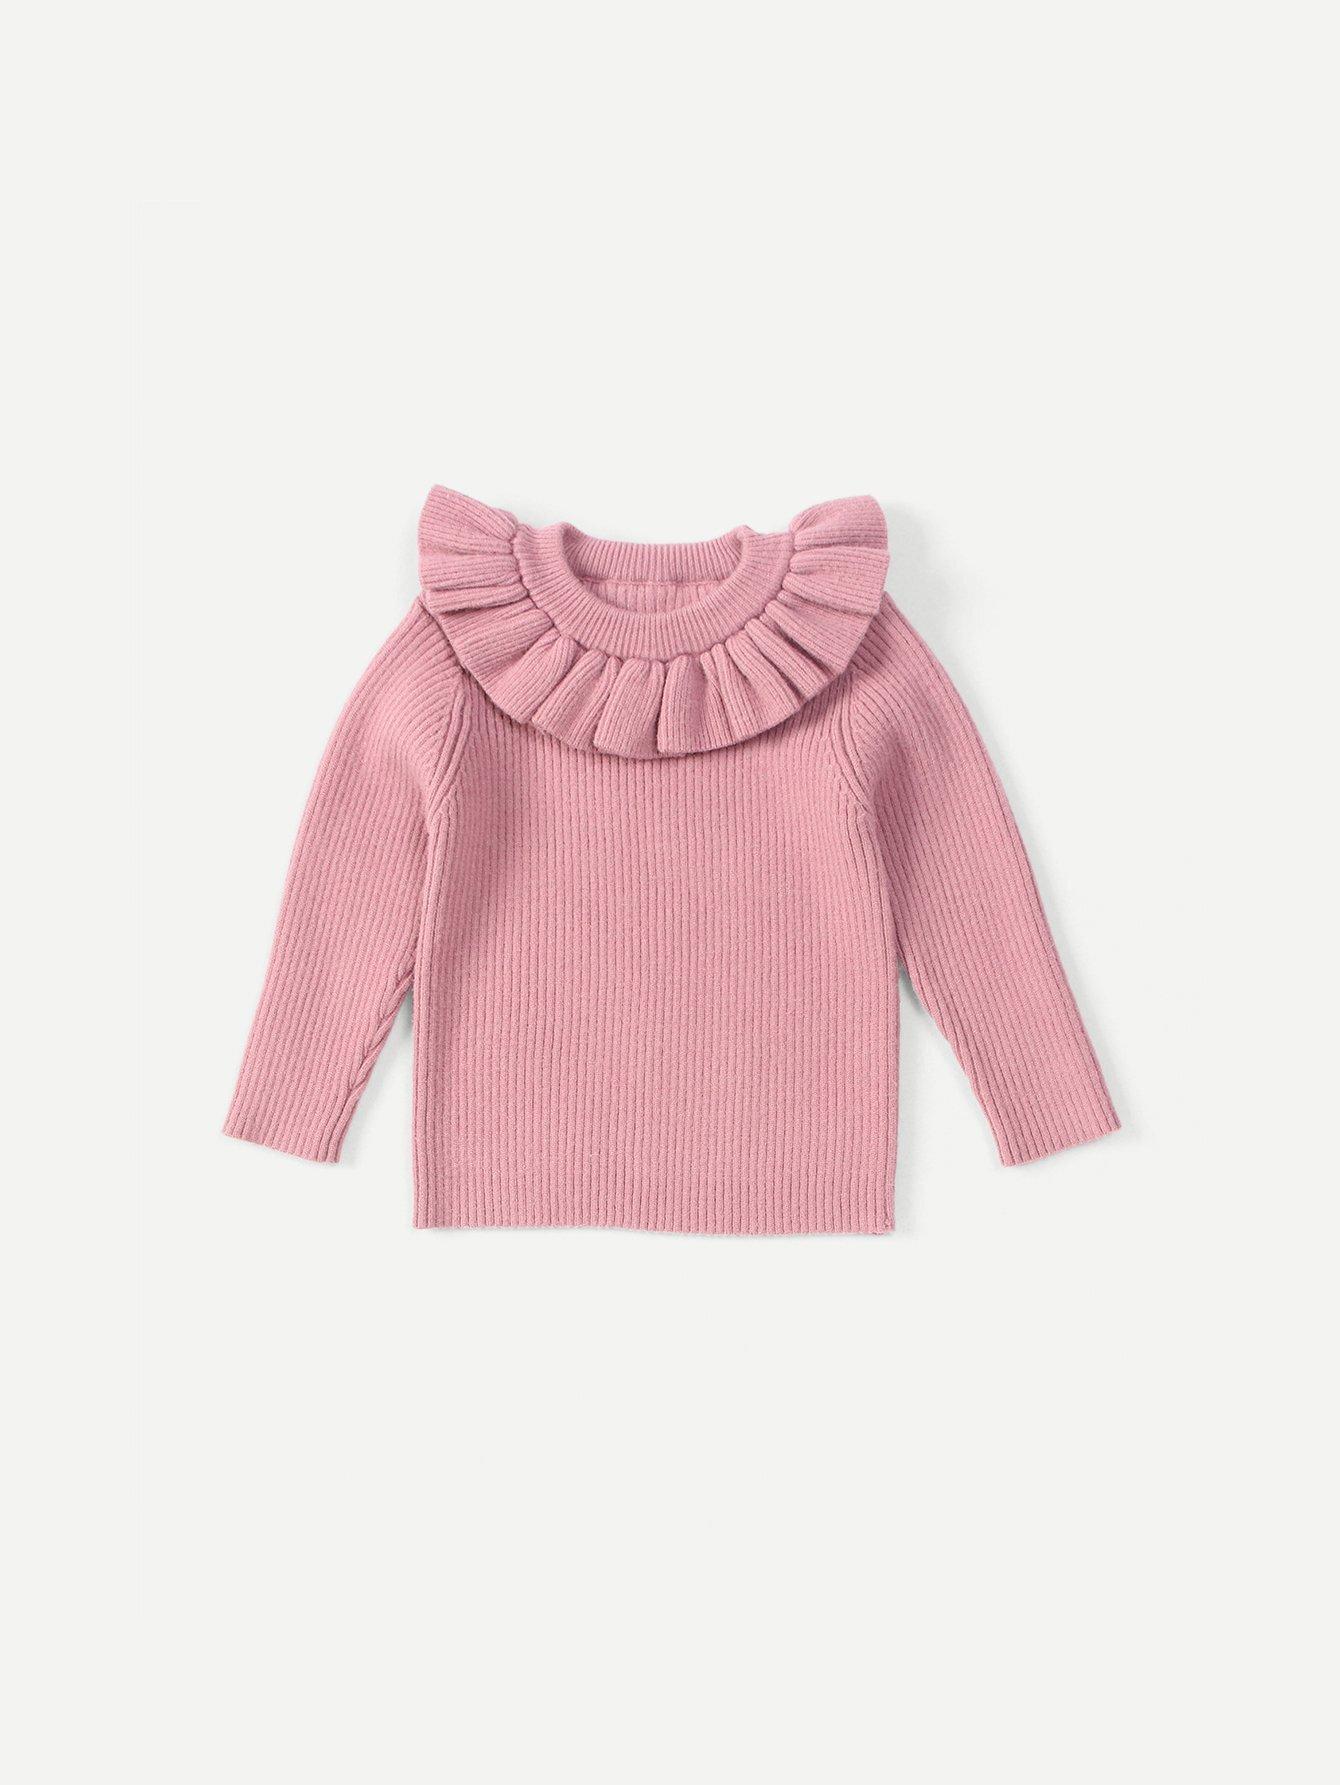 Girls Rib Knit Trim Ruffle Sweater